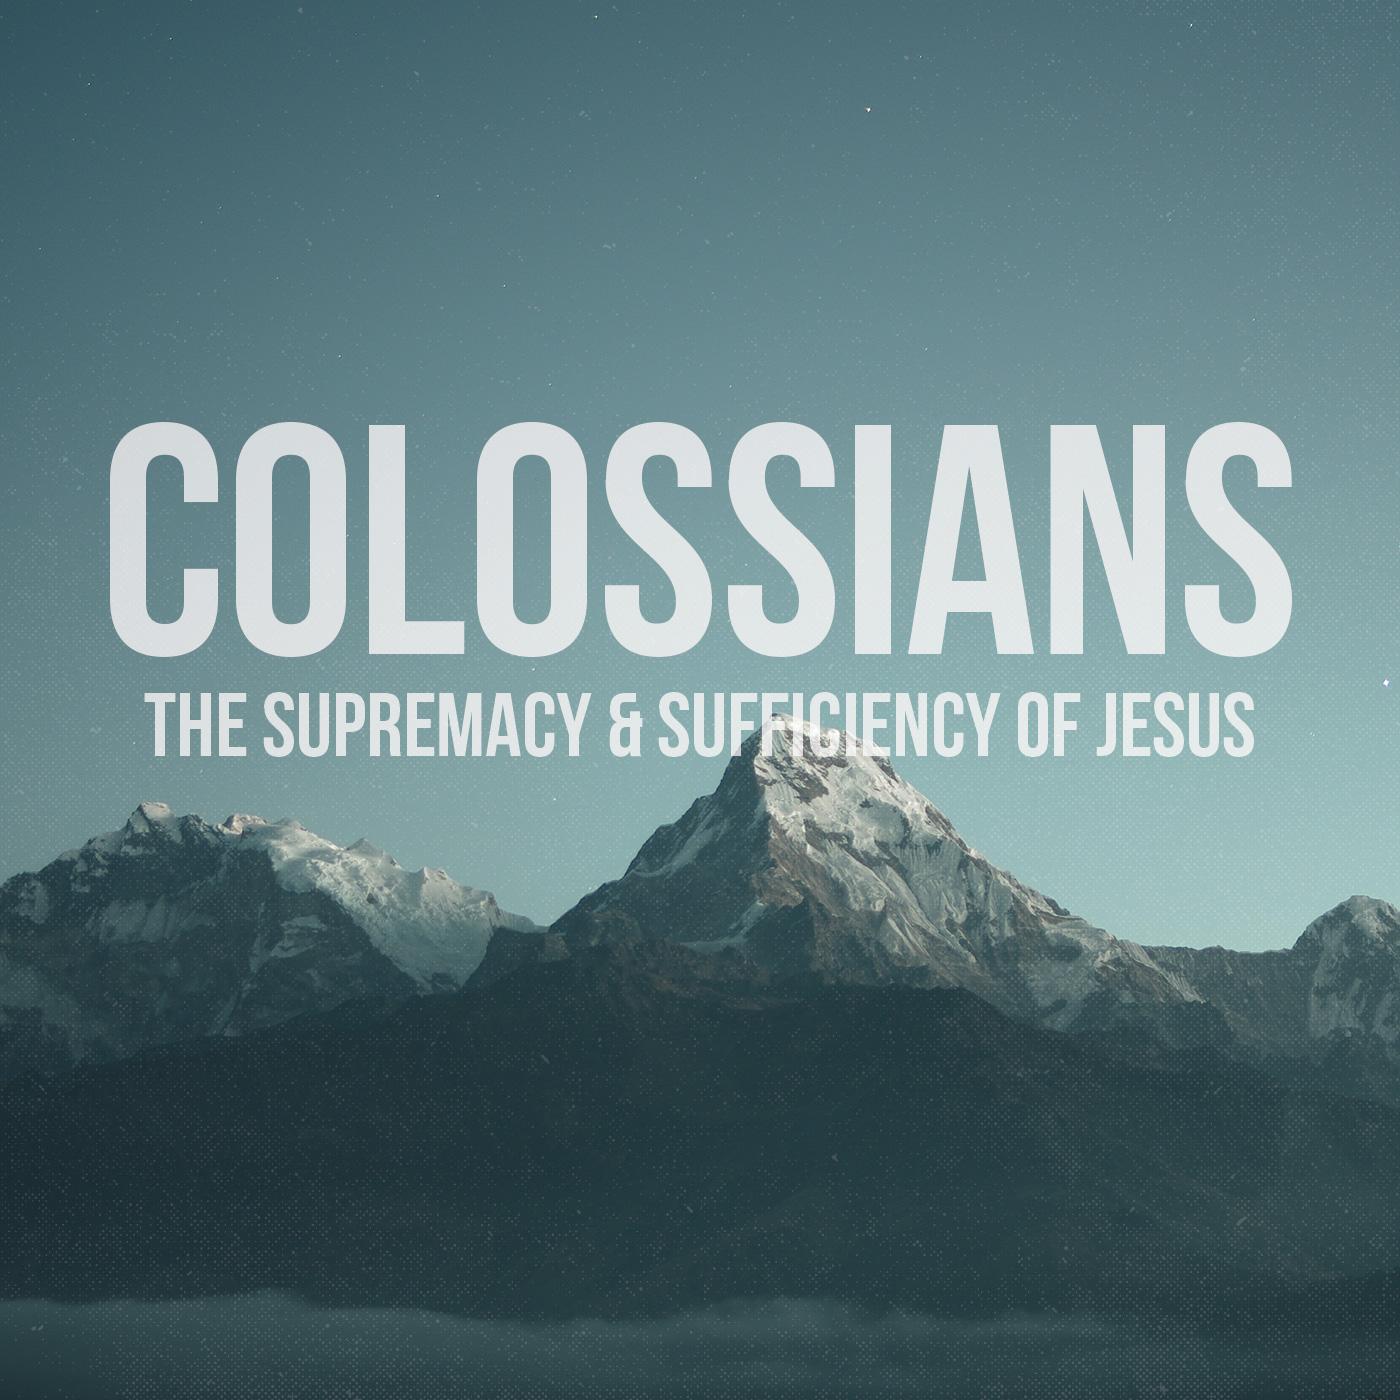 Colossians---Insta-2.jpg